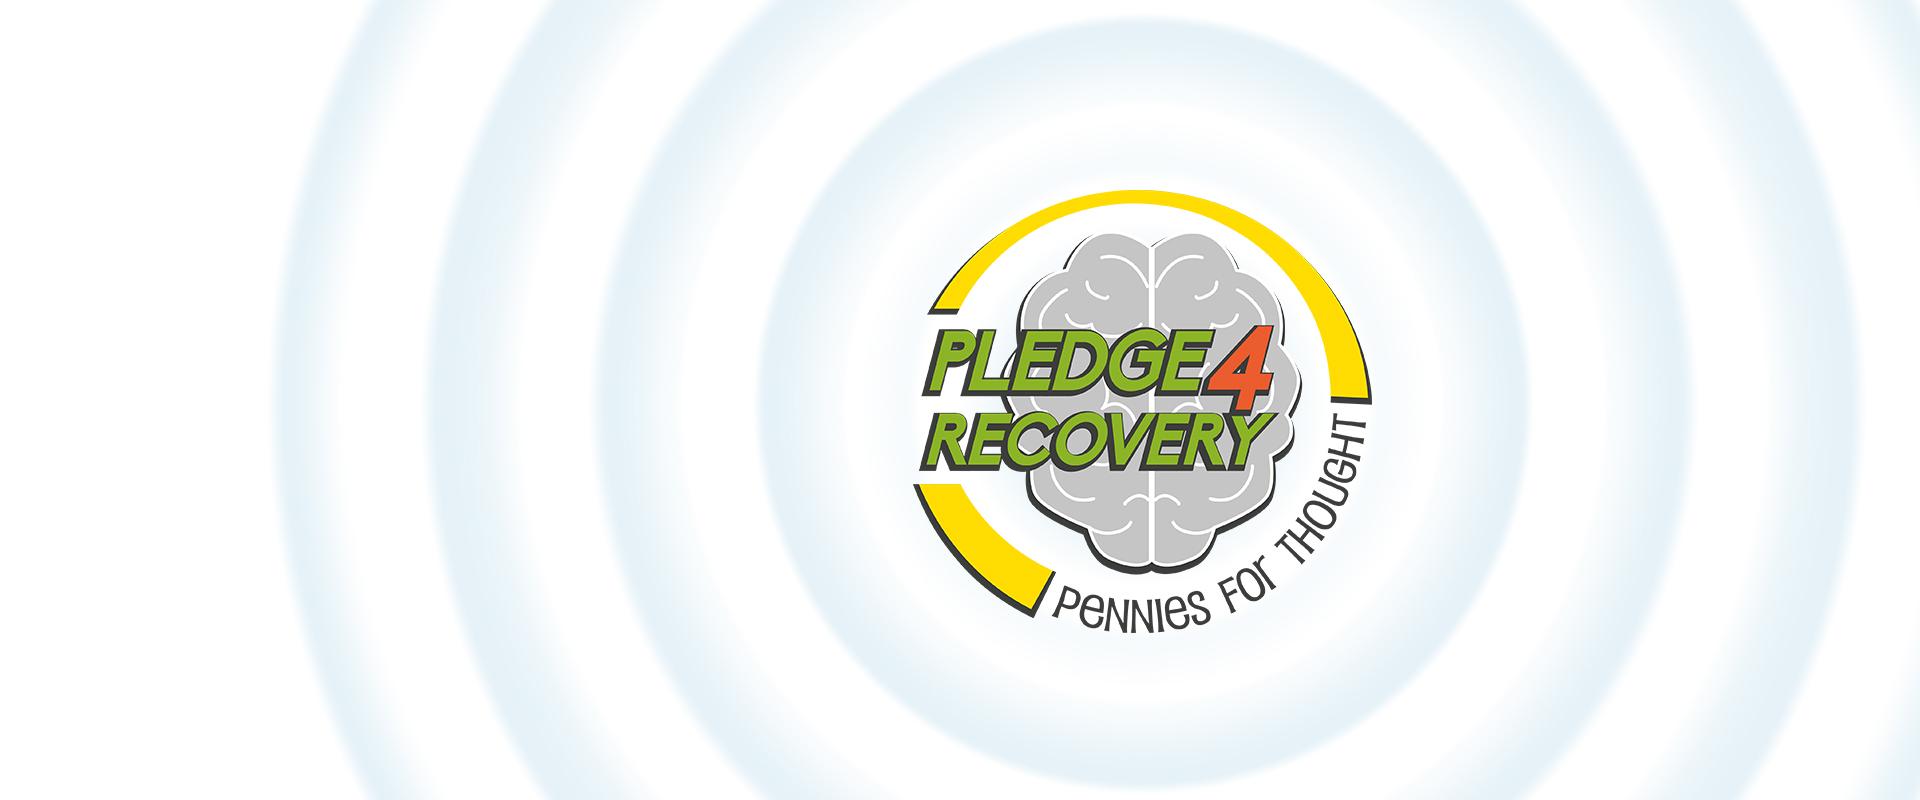 Pledge 4 Recovery